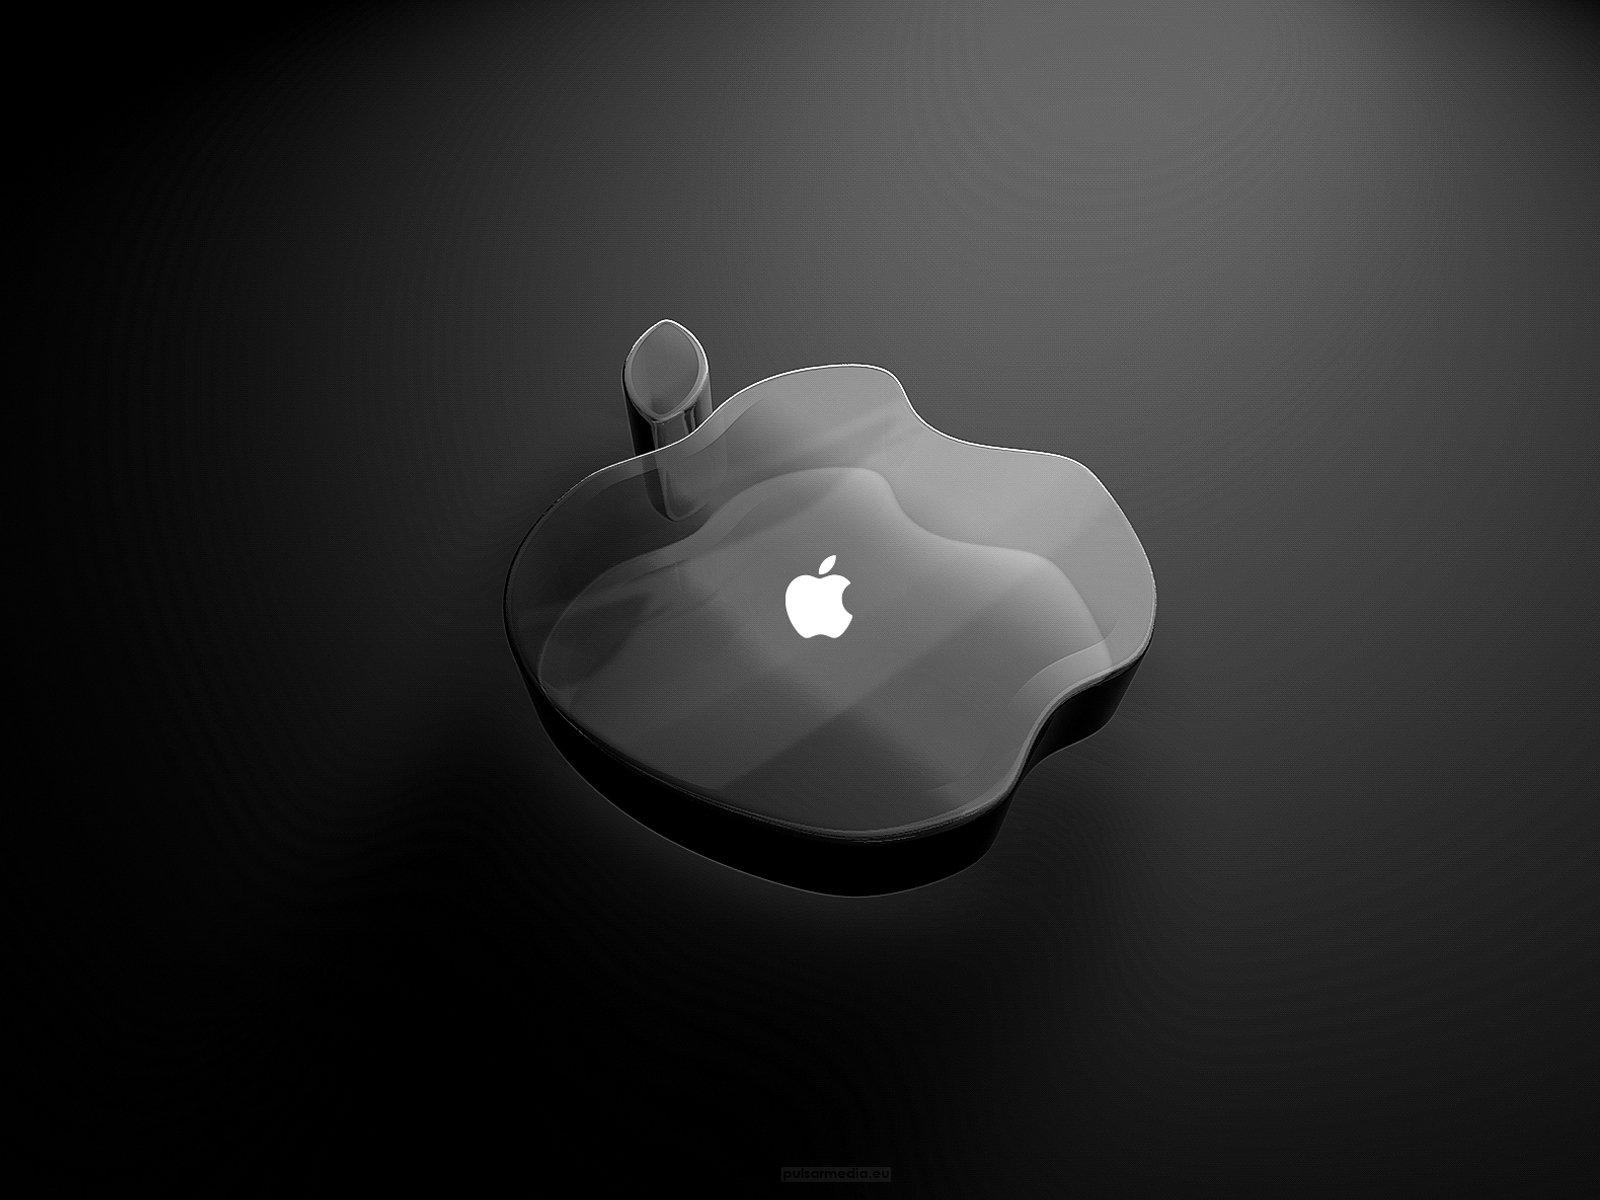 50 Inspiring Apple Mac iPad Wallpapers For Download 1600x1200